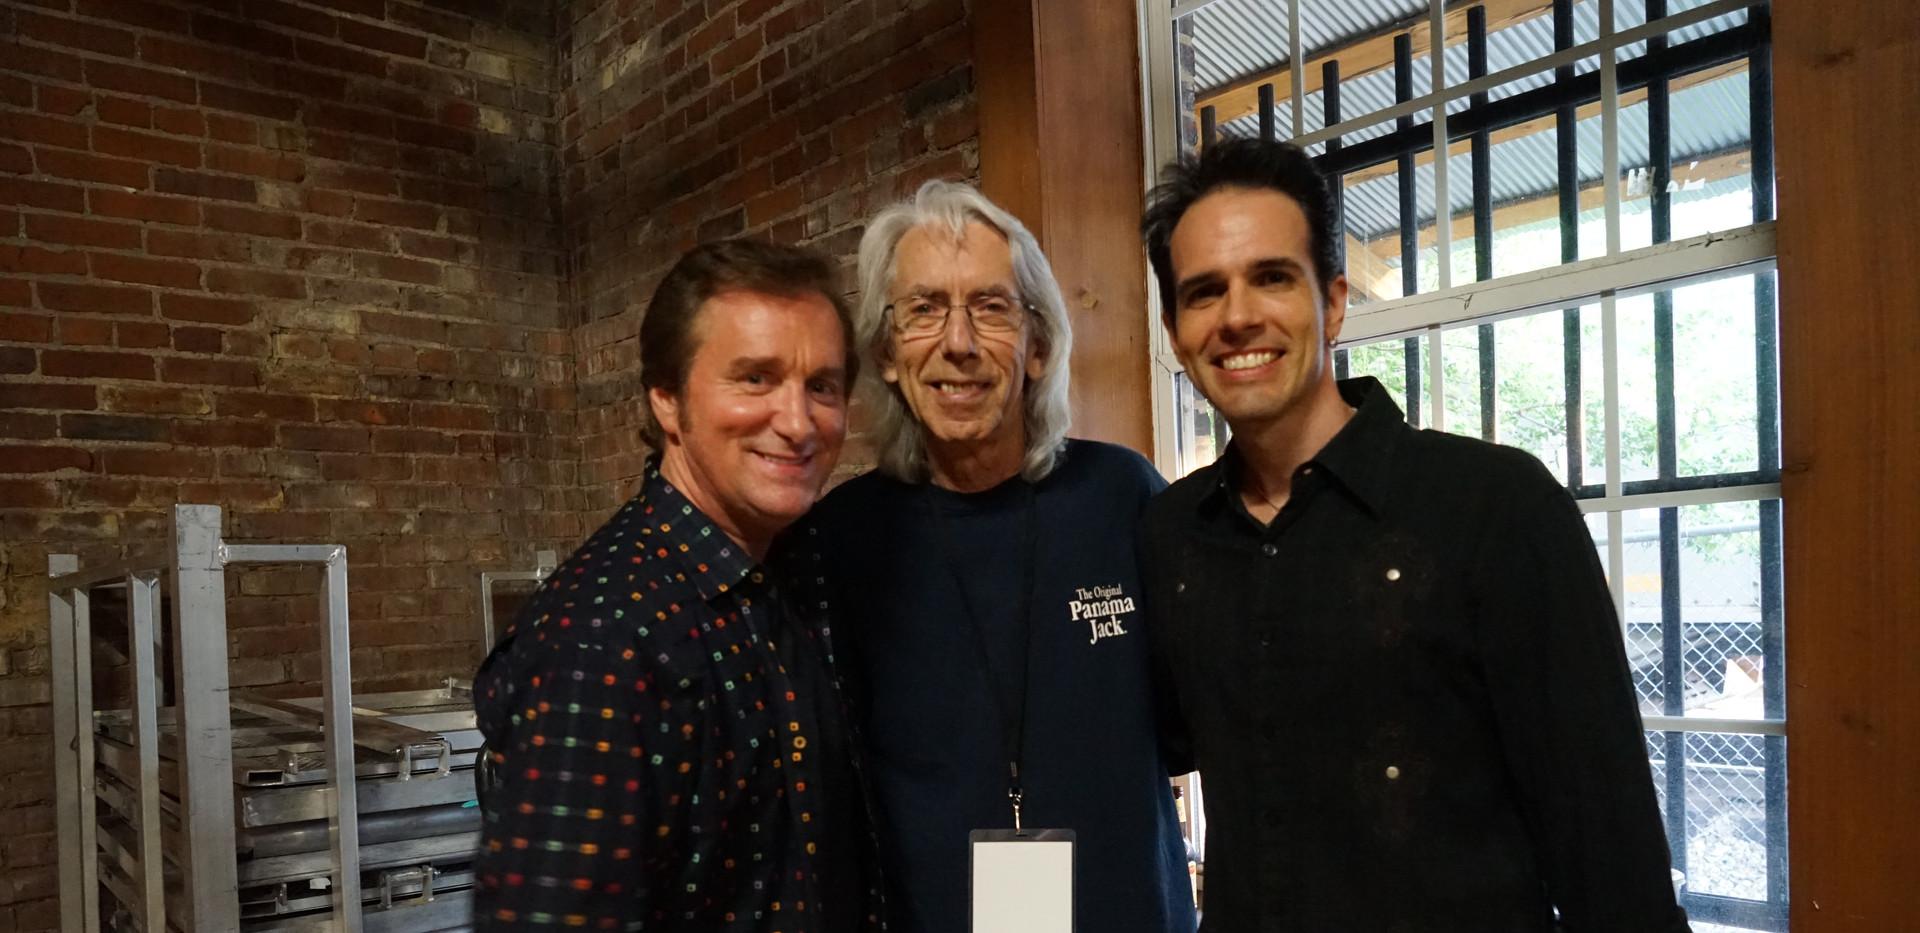 Darrell Toney, Wayne Moss & Rodney Ingle